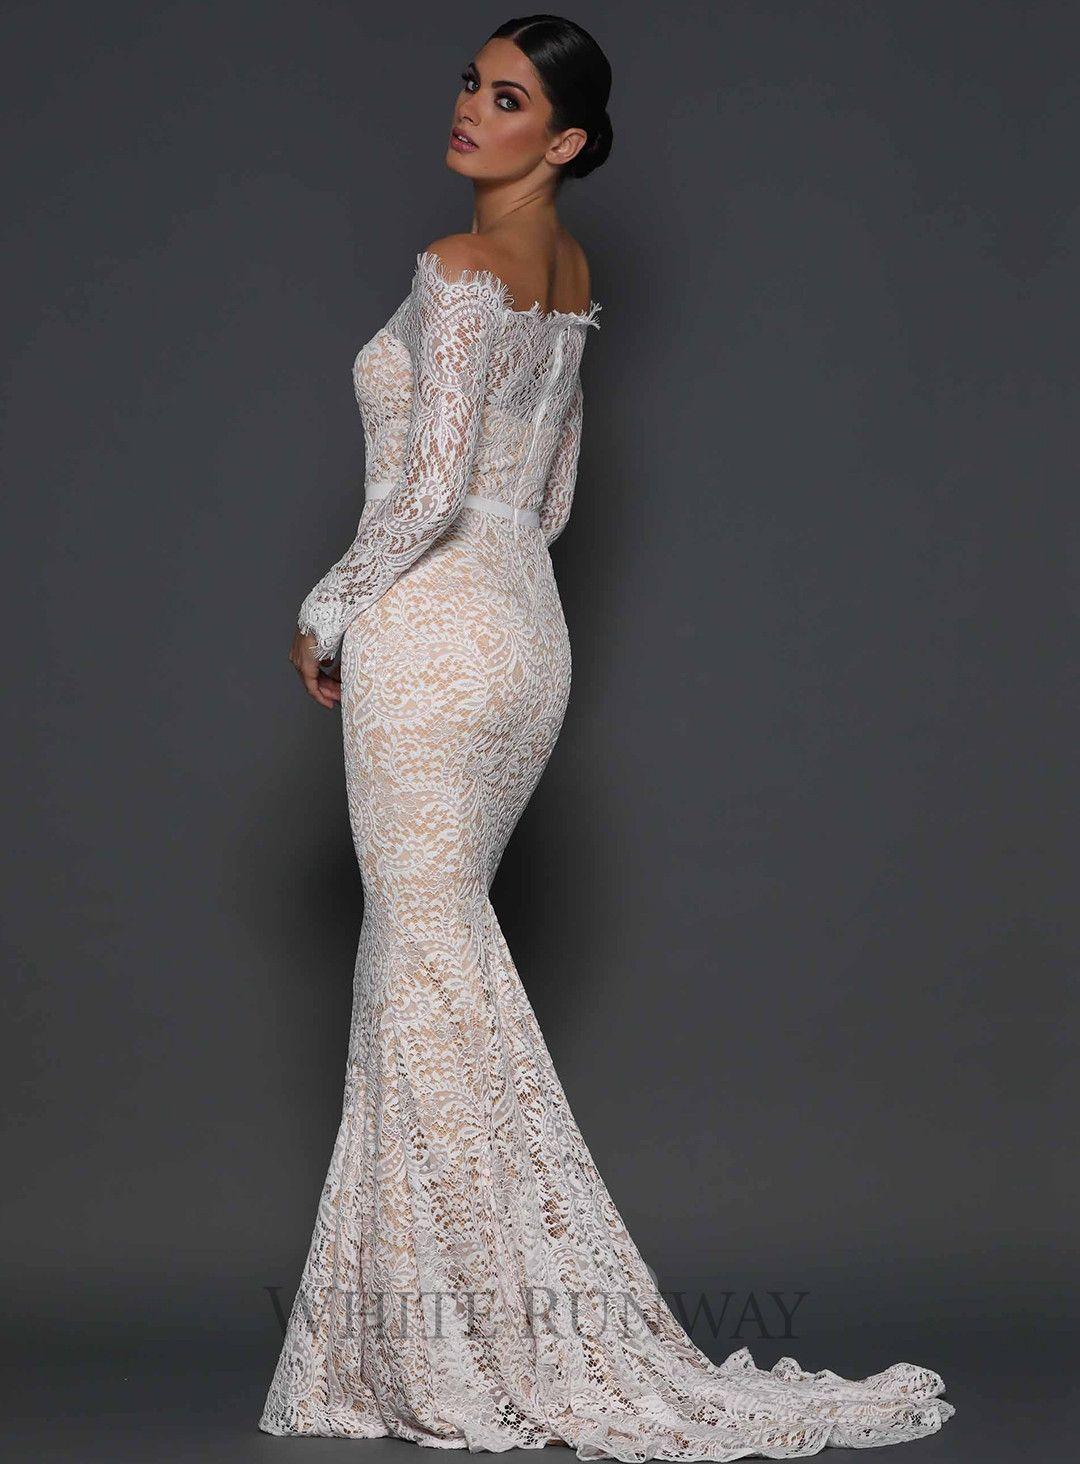 Serine Gown Simple lace wedding dress, Sweet wedding